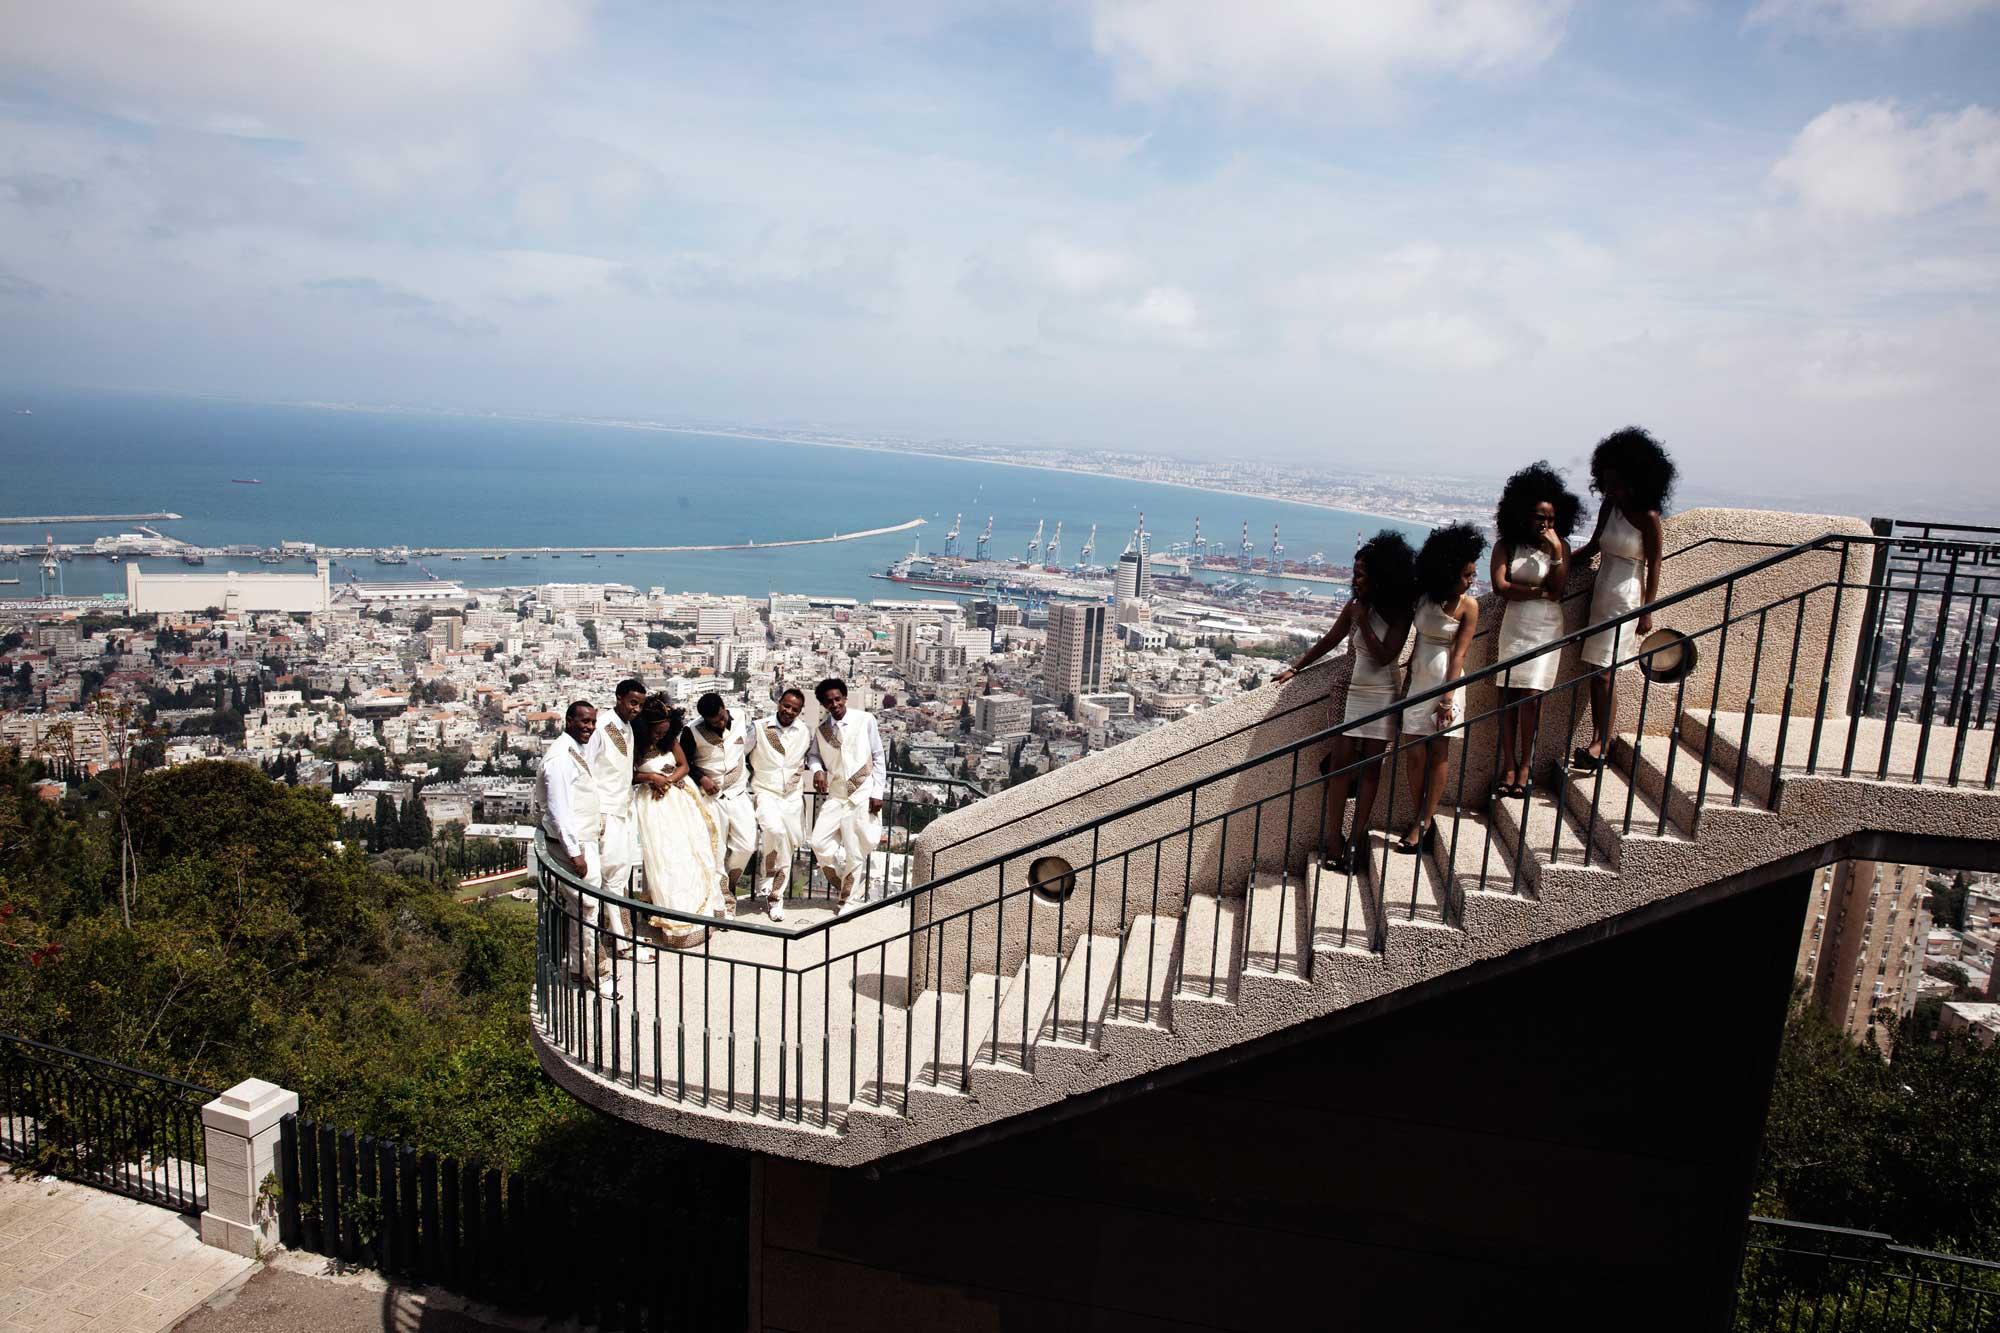 An Eritrean wedding in Haifa, Israel. April 12, 2014